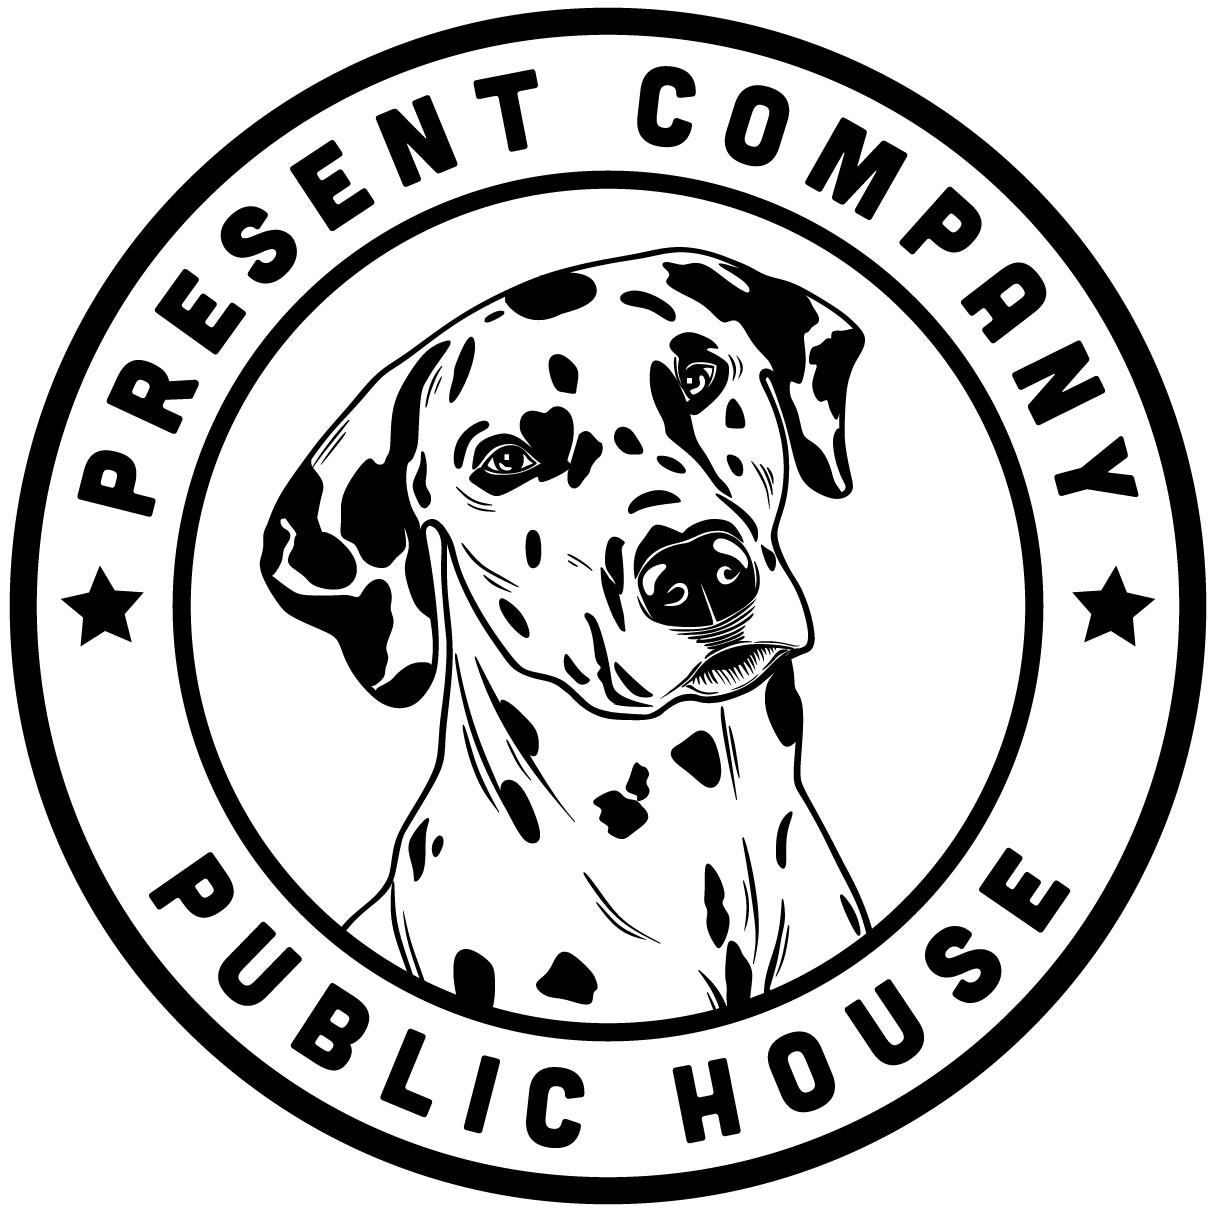 Present Company Public House